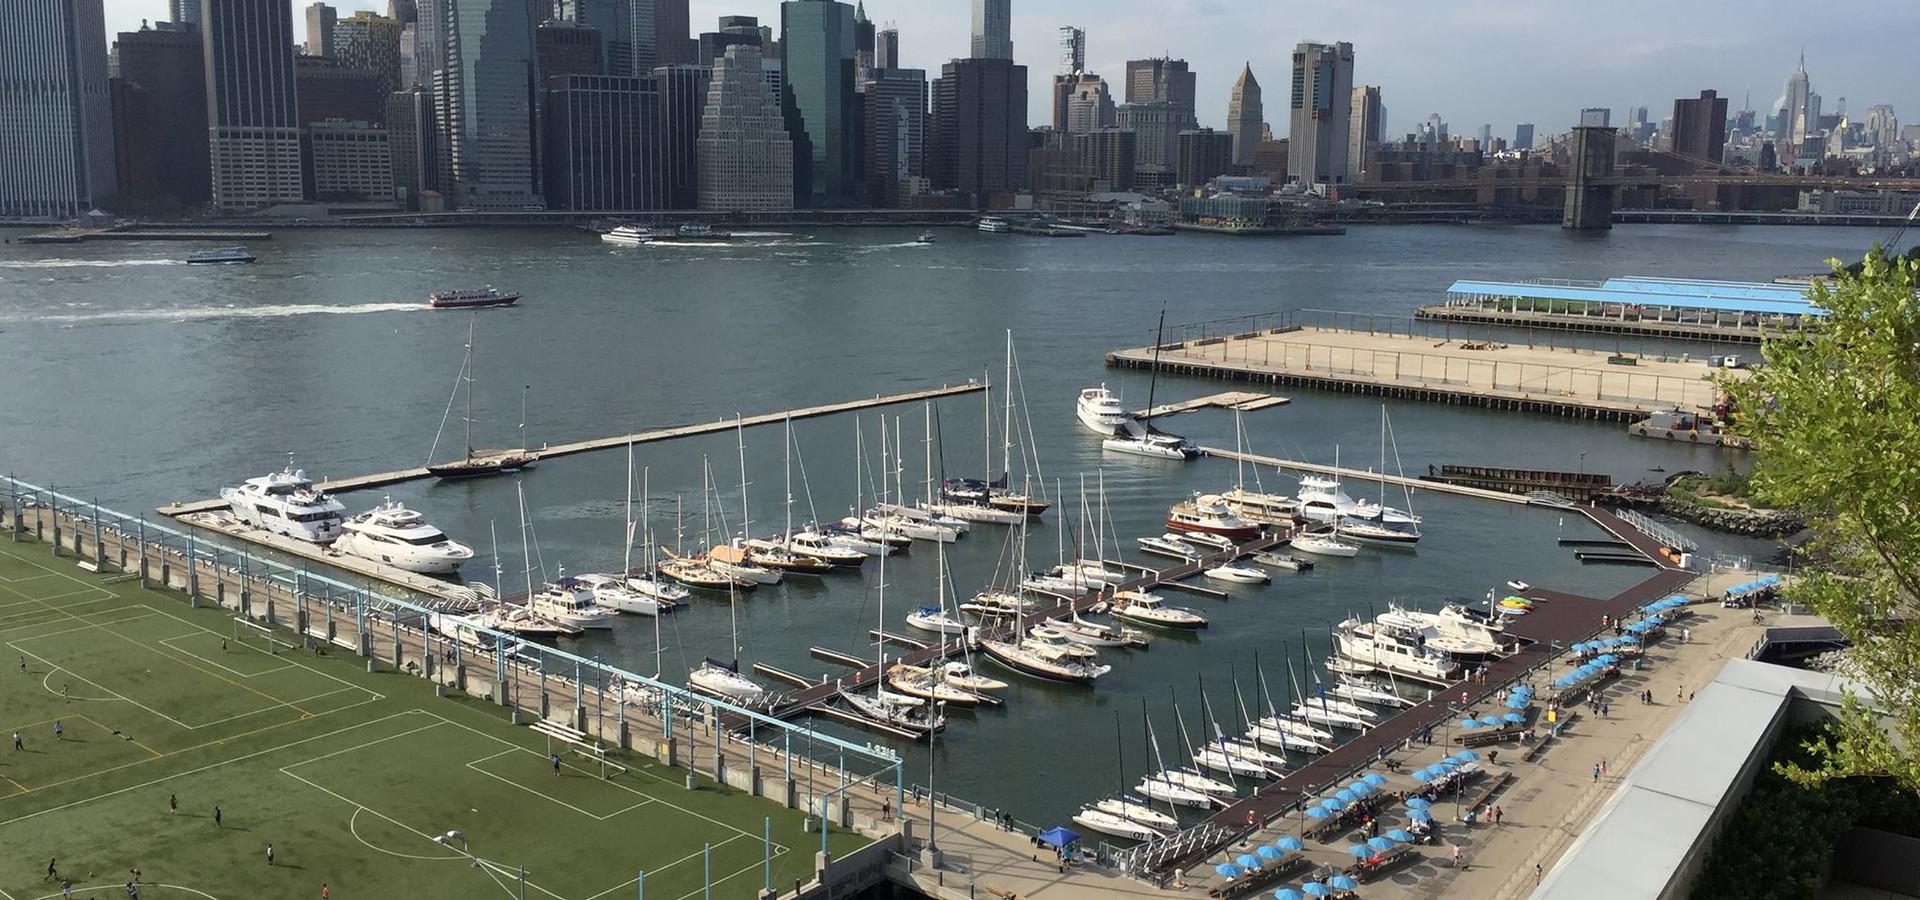 Brooklyn Bridge Park Marina | Brooklyn, NY